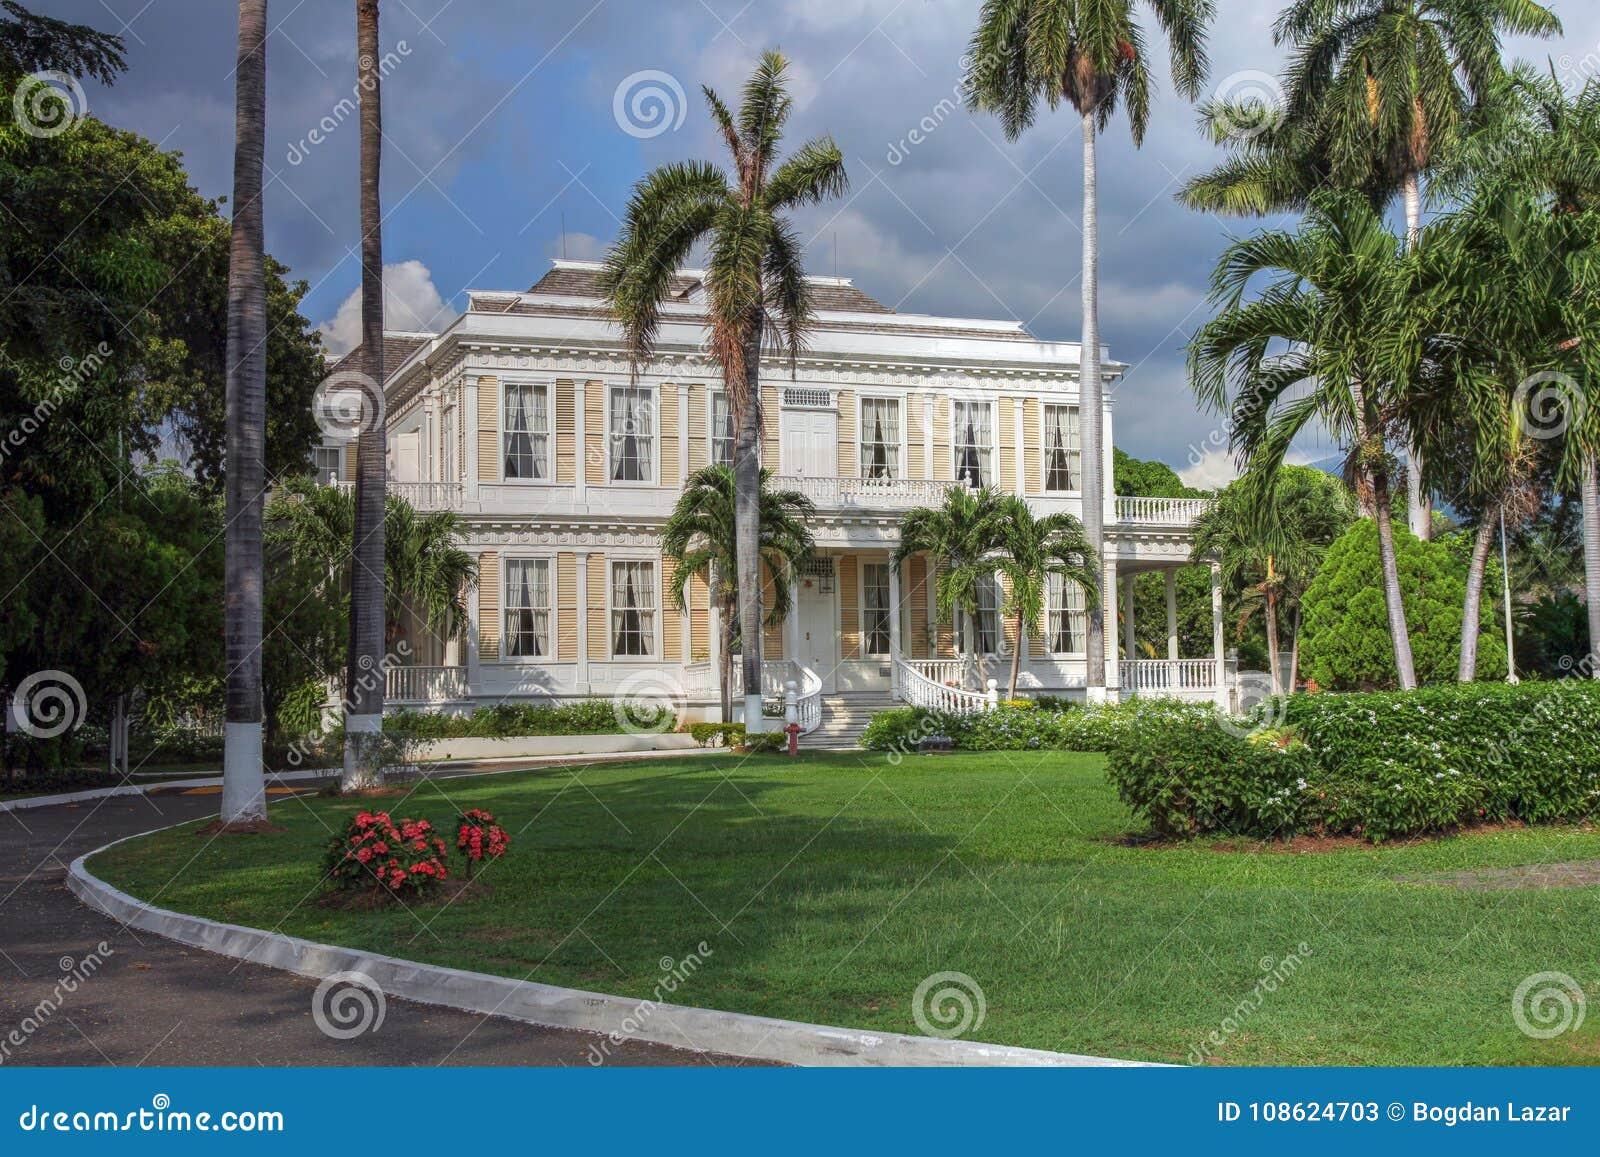 Devon House Kingston, Jamaica